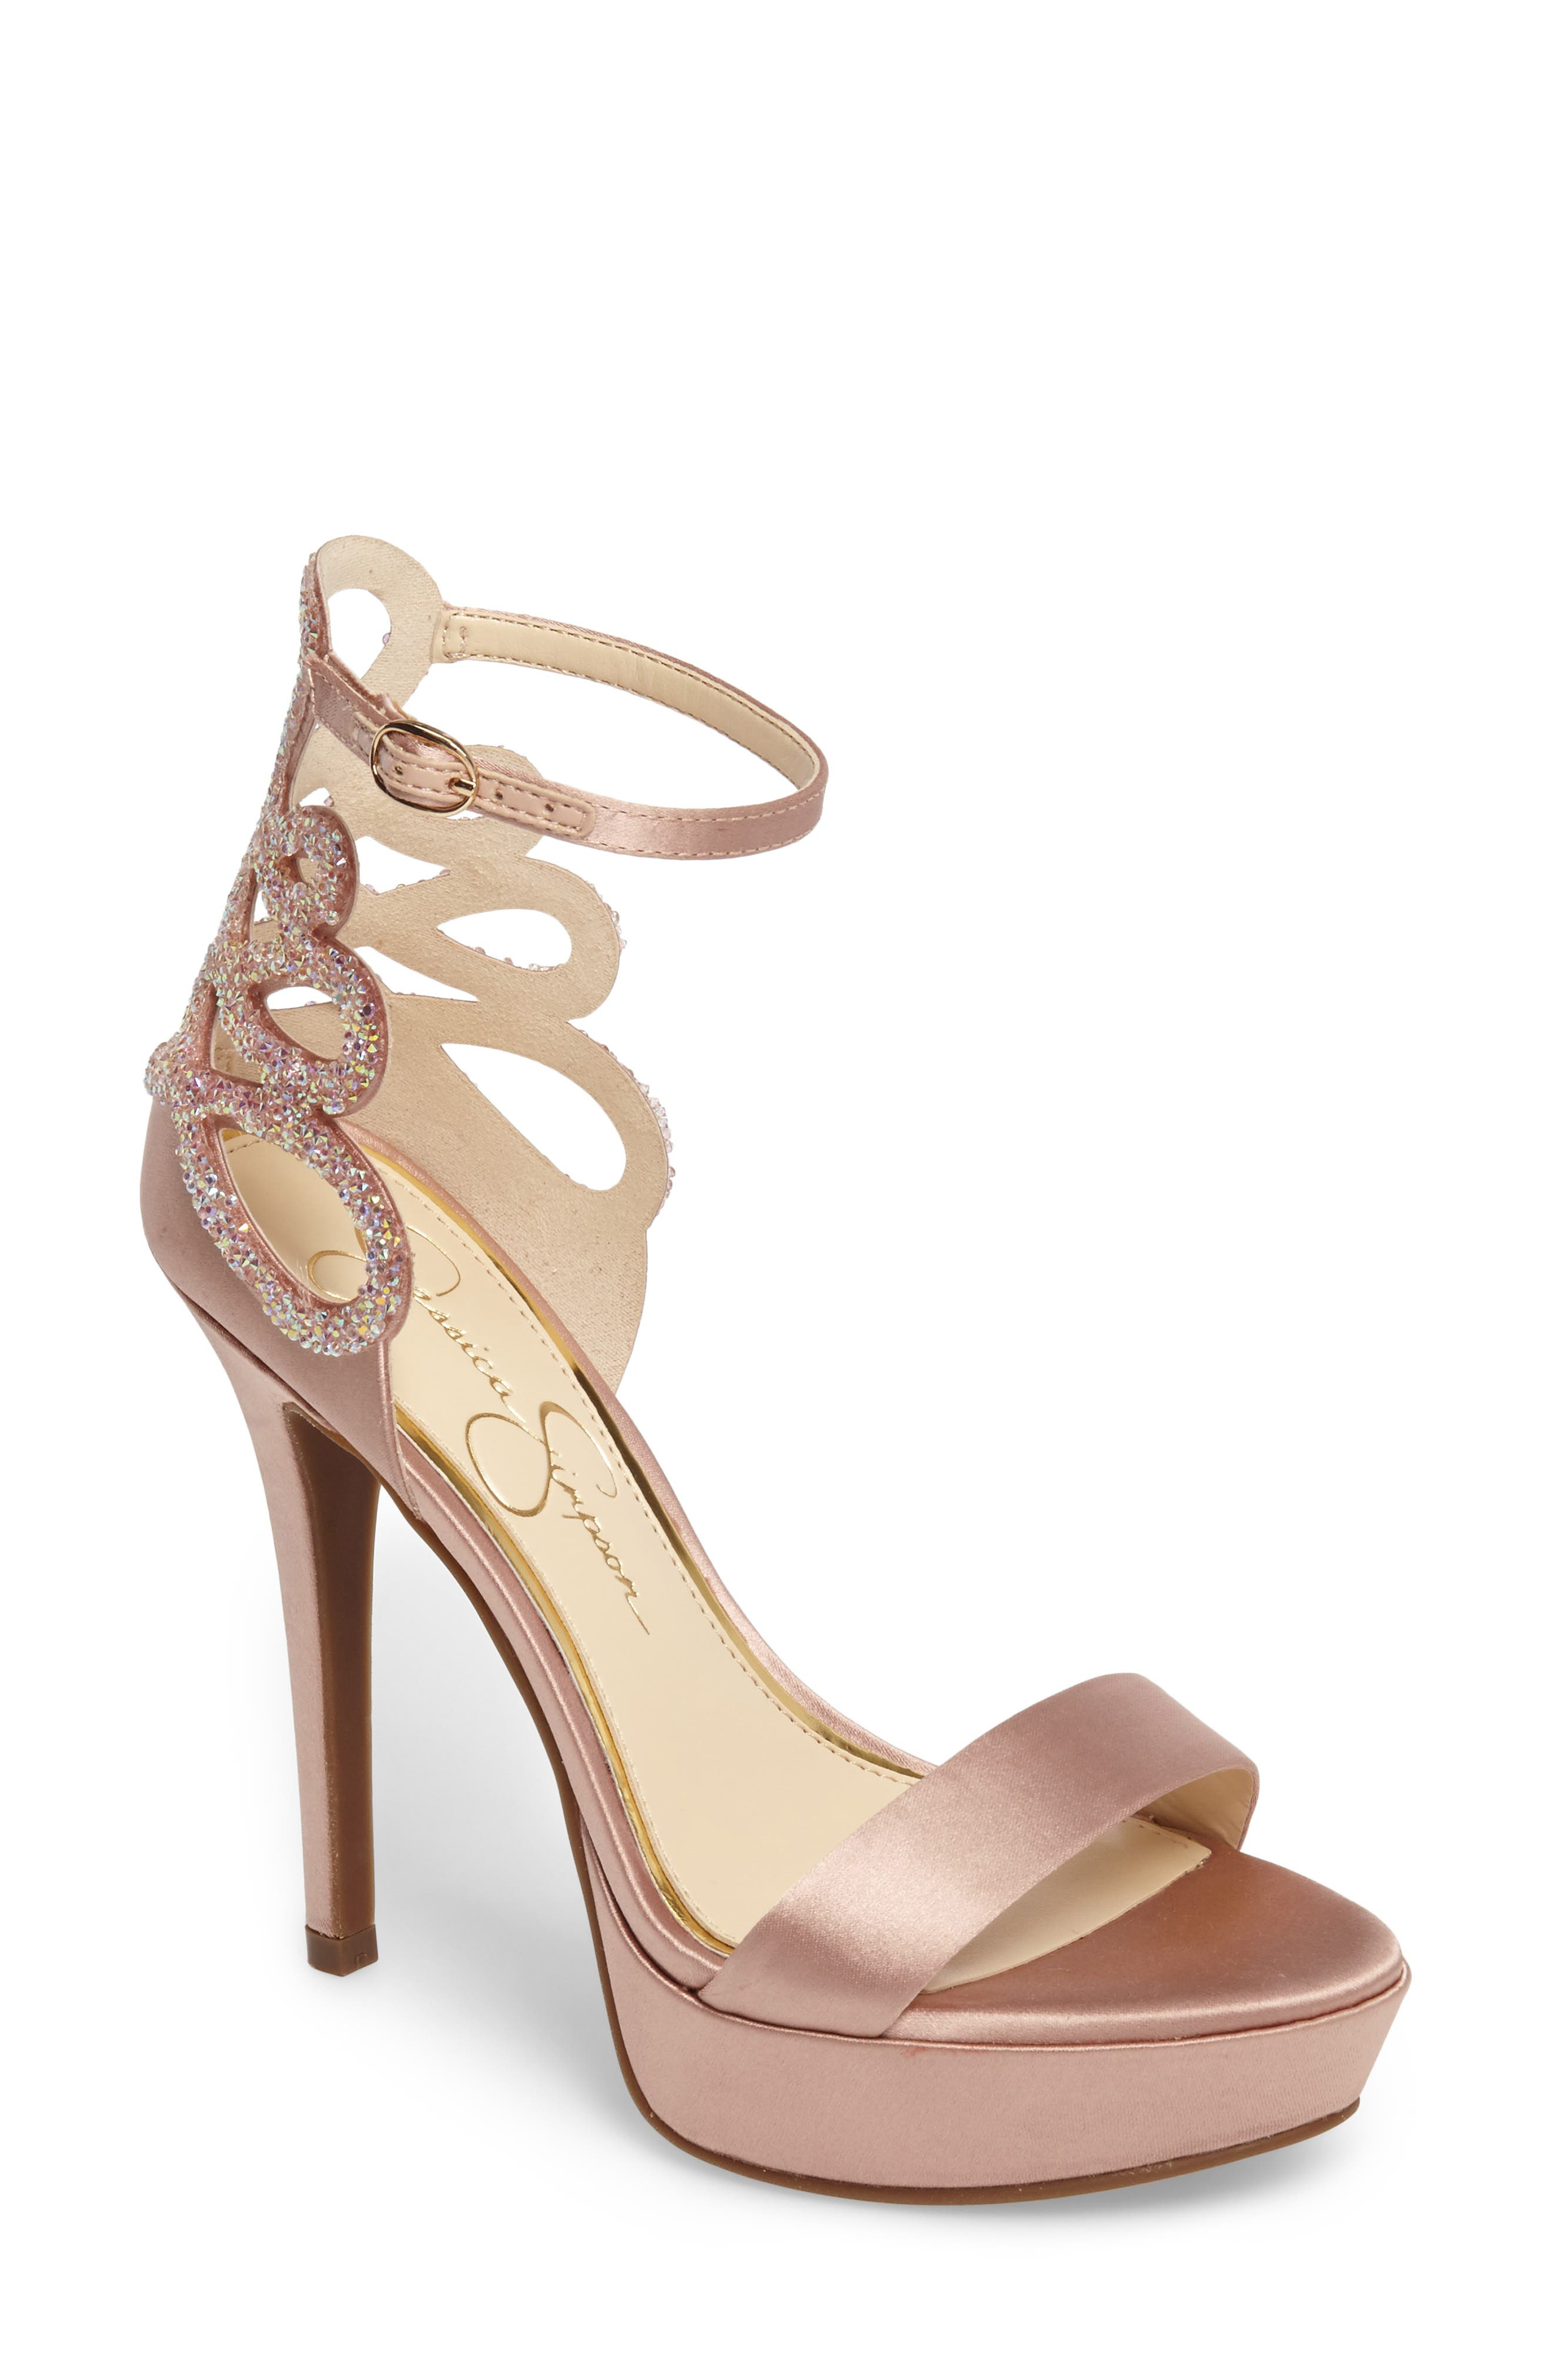 Alternate Image 1 Selected - Jessica Simpson Bayvinn Platform Sandal (Women)